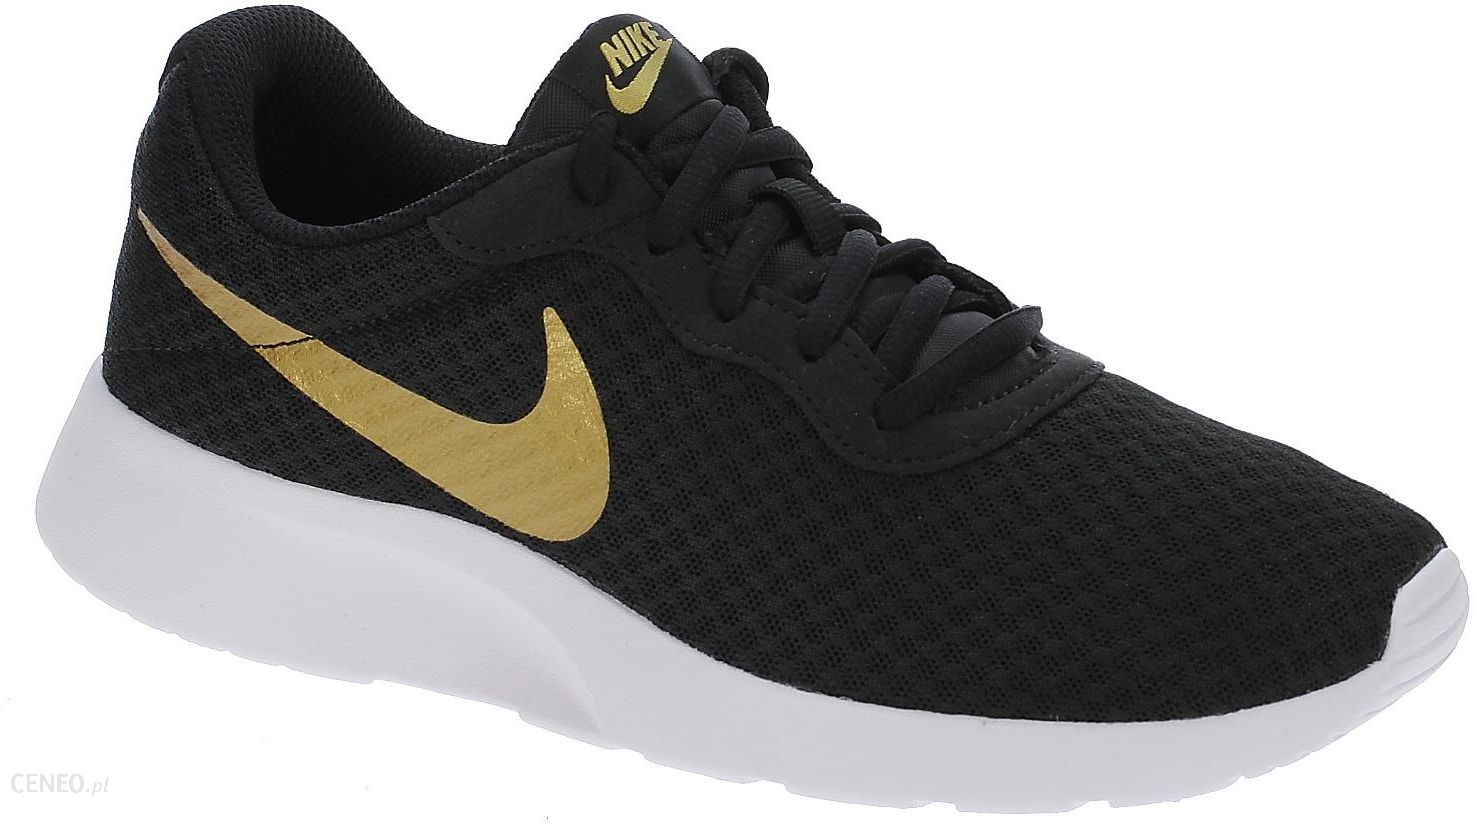 18d0a5236 Buty Nike Tanjun - Black/Metallic Gold 38 - Ceny i opinie - Ceneo.pl